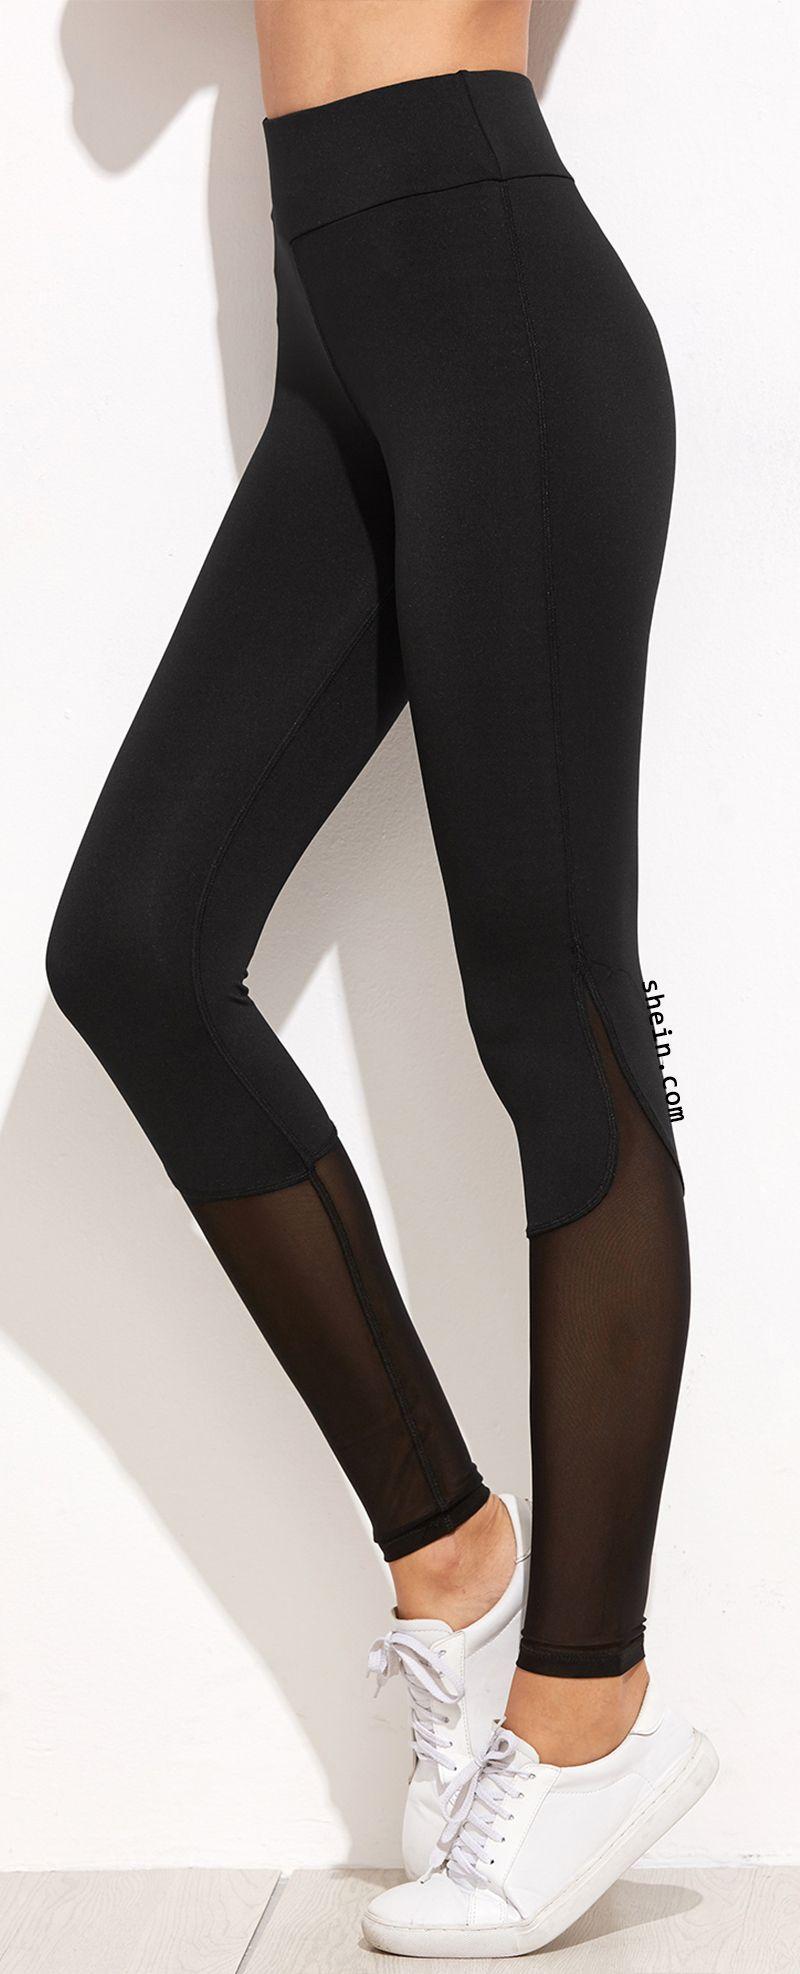 88bdfdd3c1c3e Black mesh workout leggings. Comfortable material & great fit ...